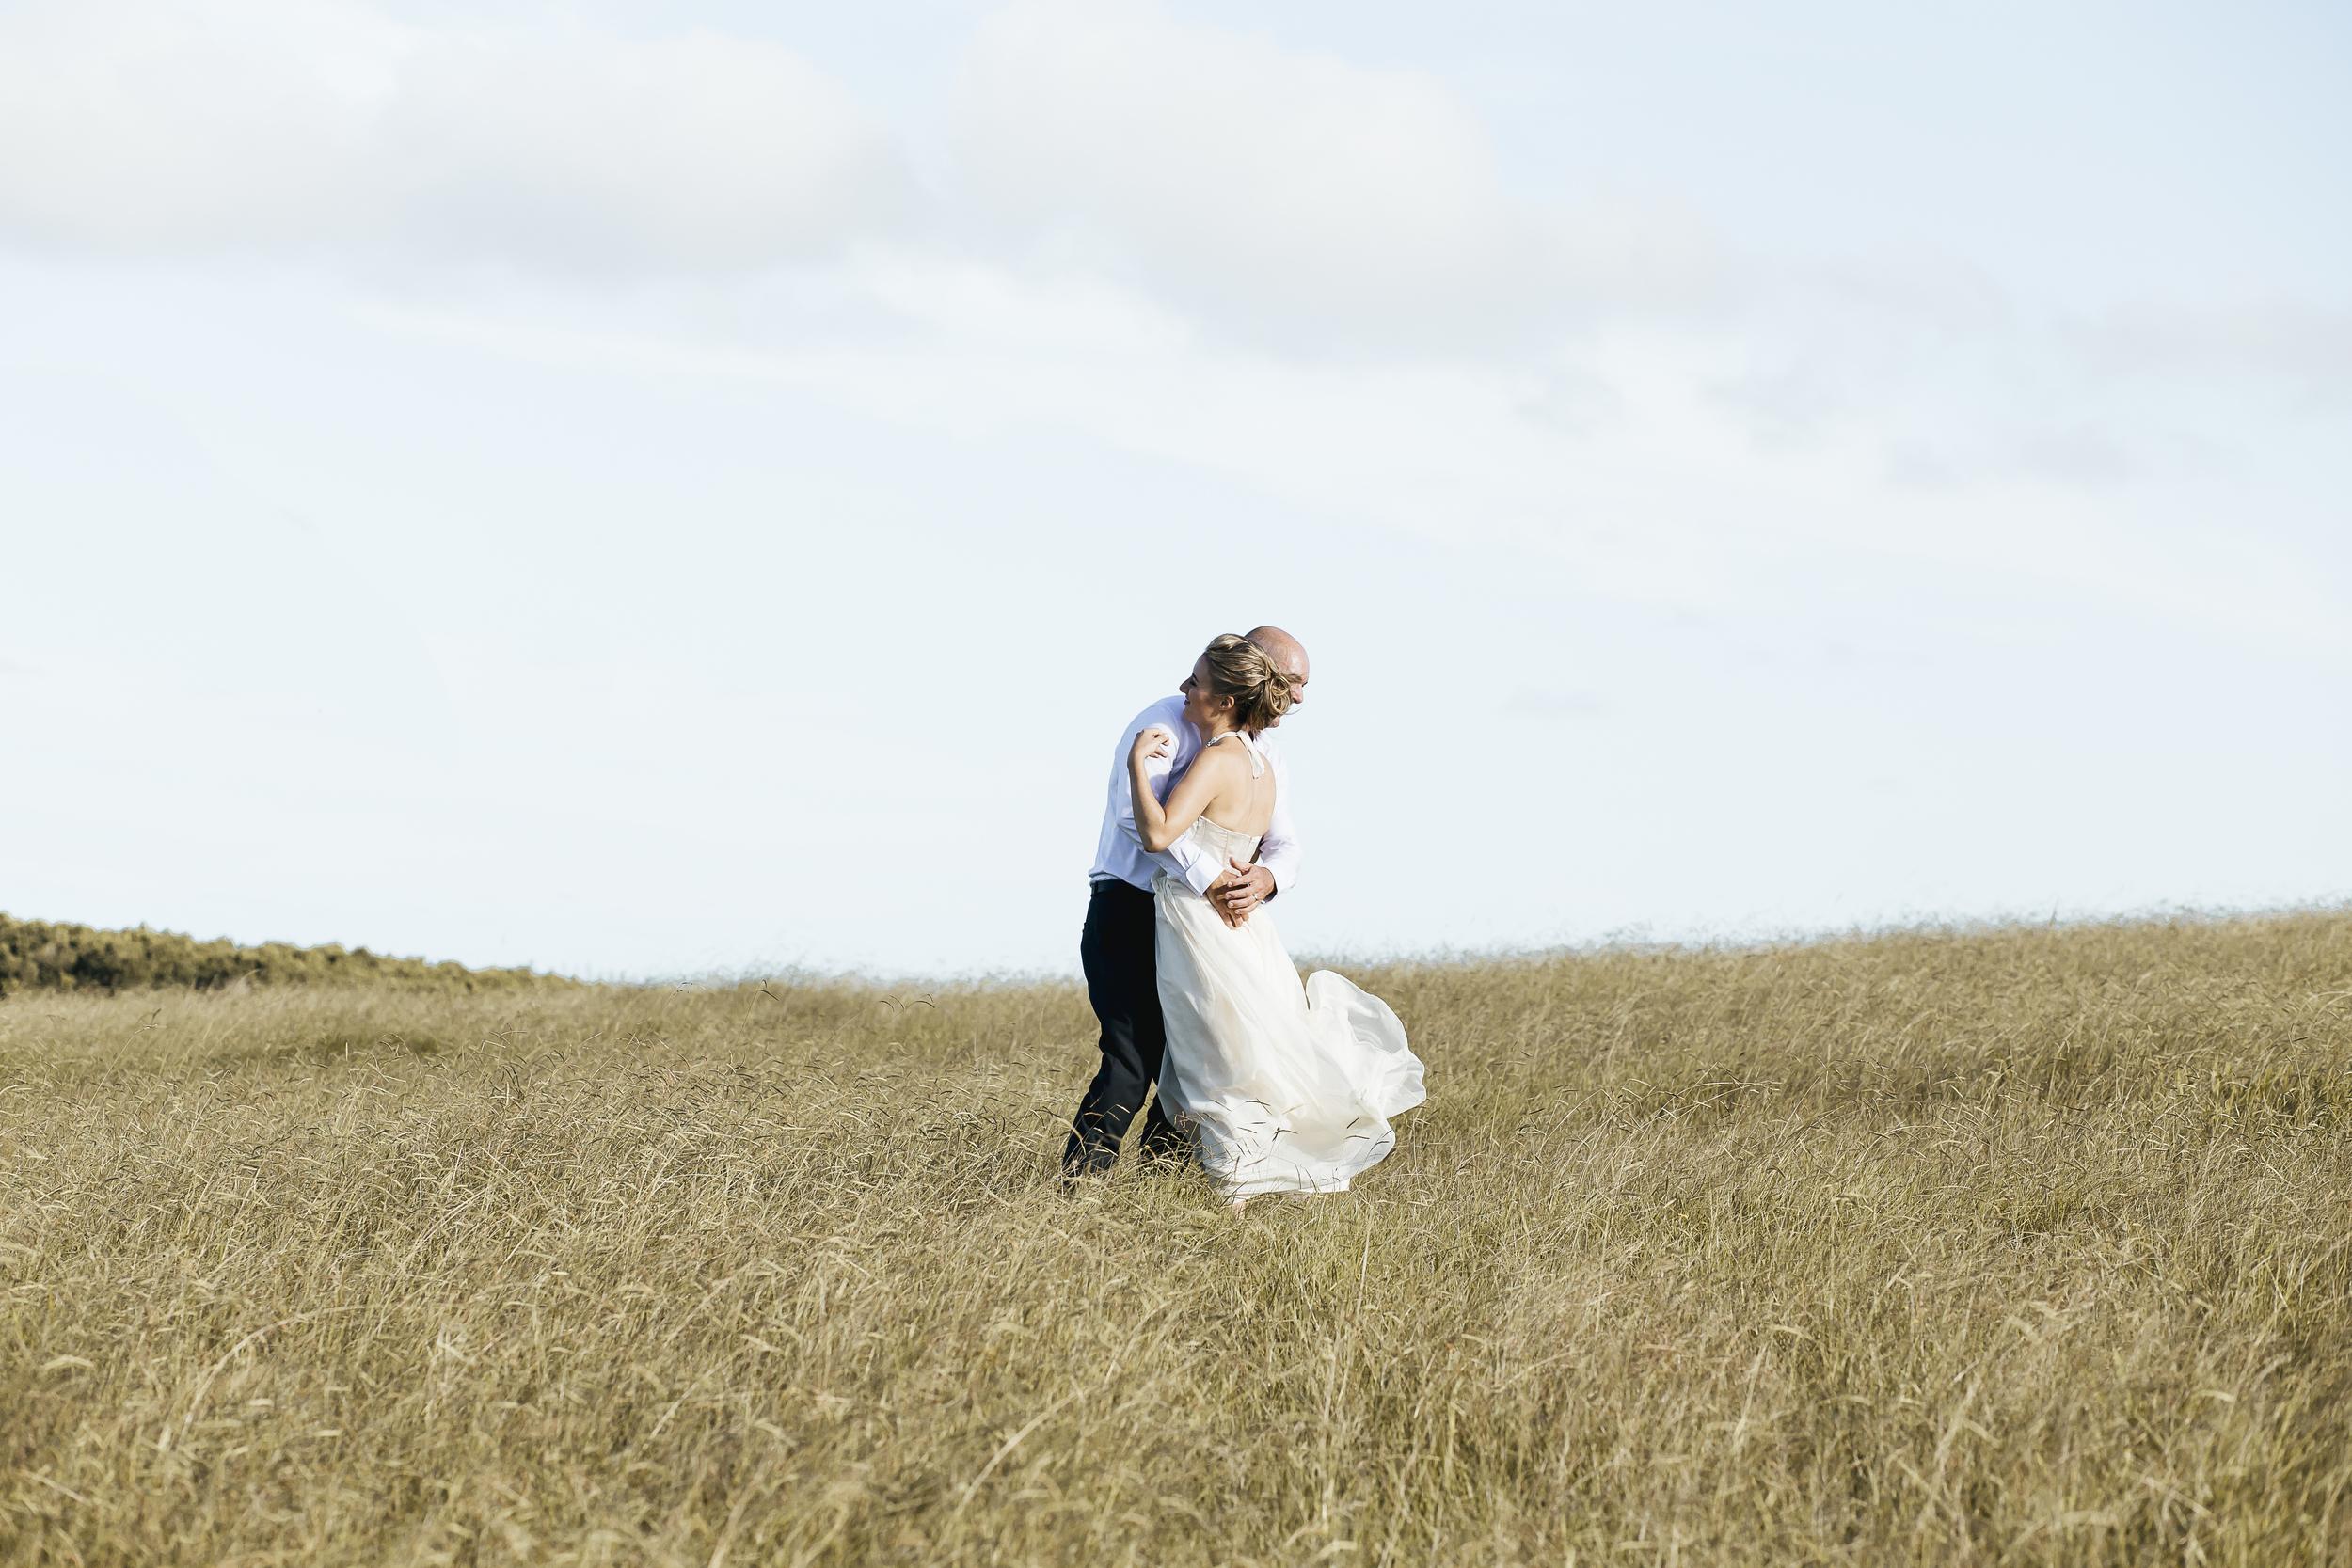 Byron Bay Wedding Harvest Cafe - Carly Tia Photography 022.jpg